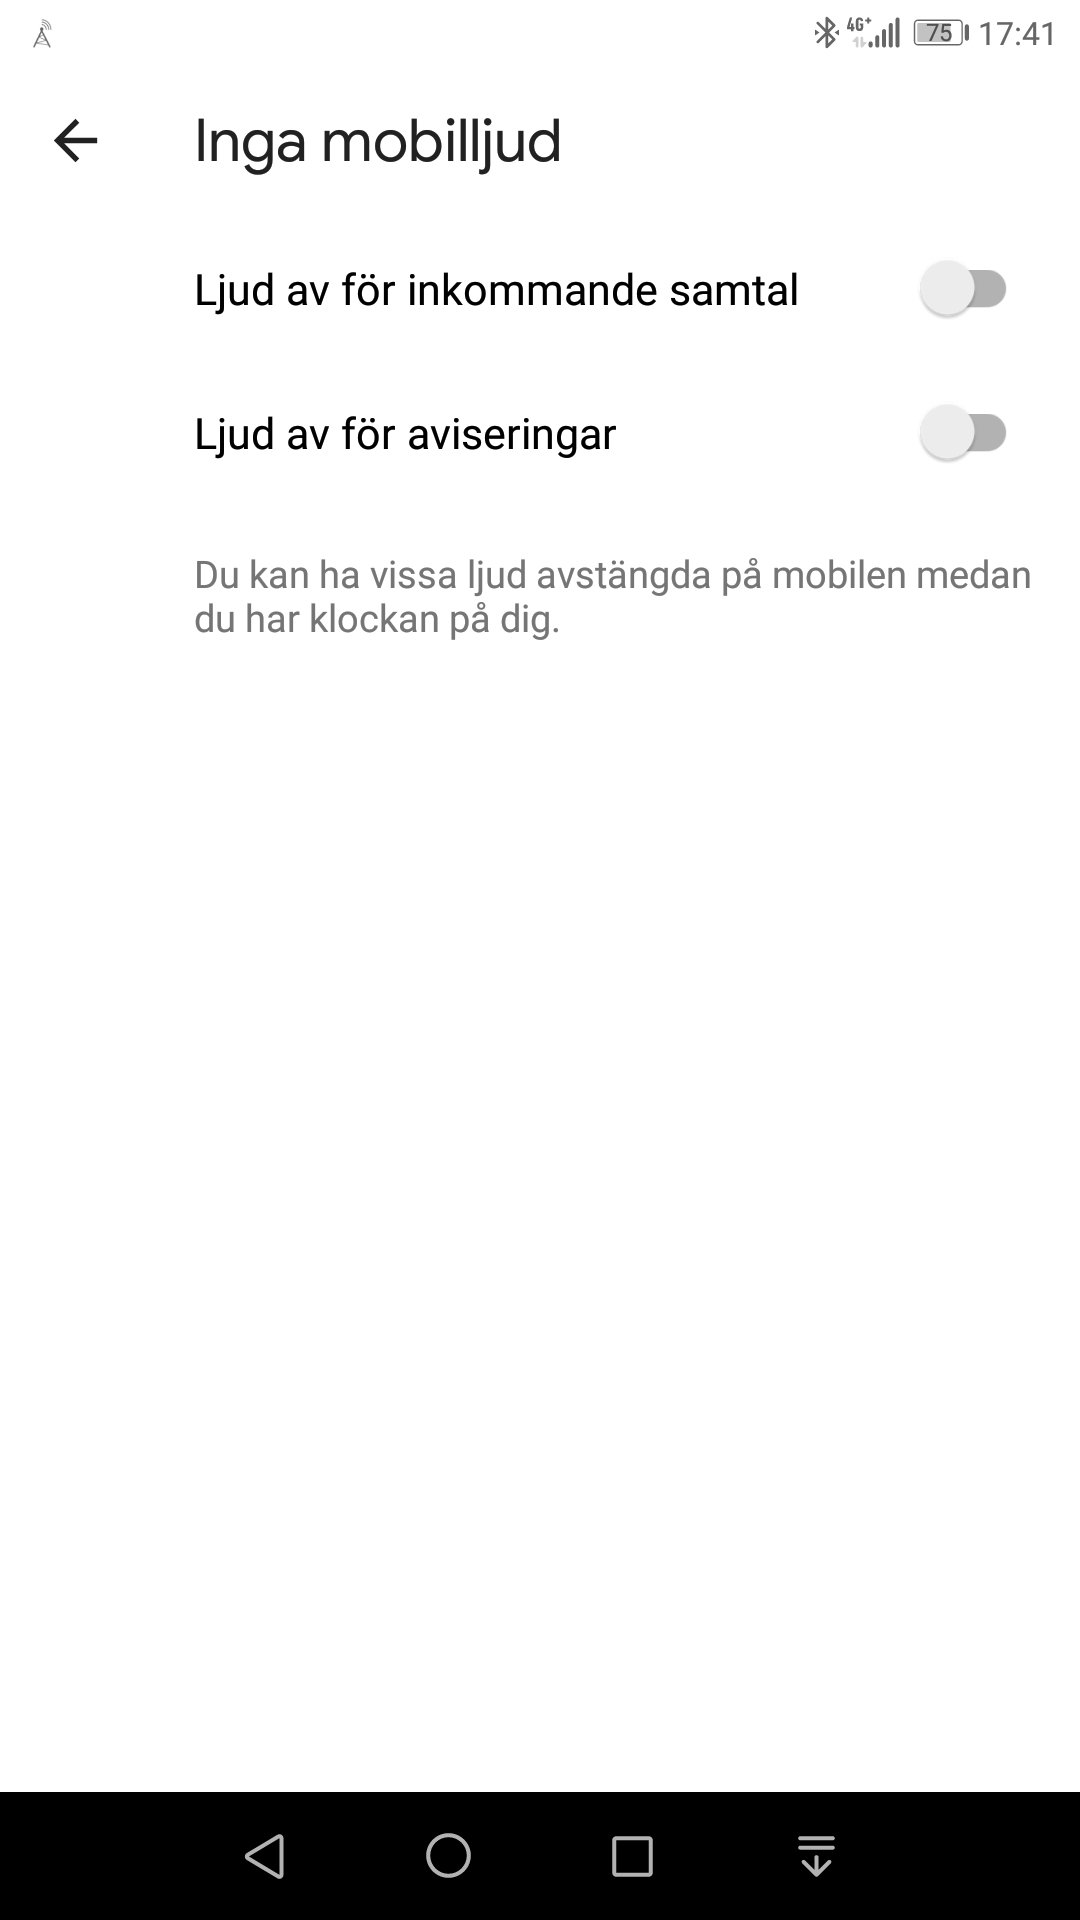 Screenshot_20181114-174106.jpeg